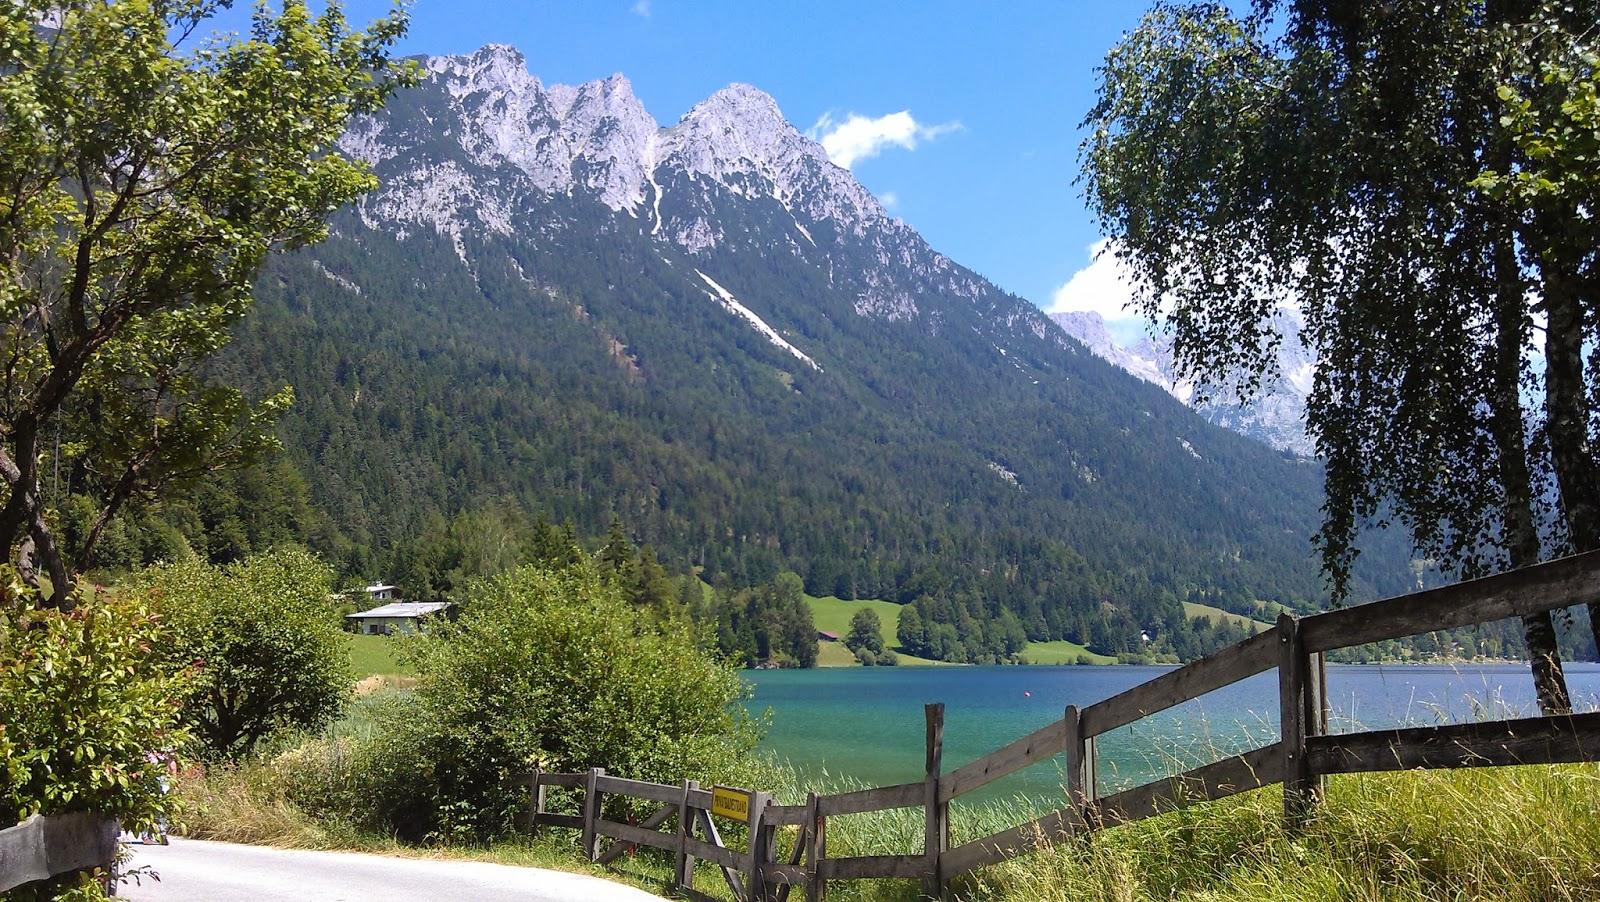 My top ten hikes - No. 3 Hintersteiner See